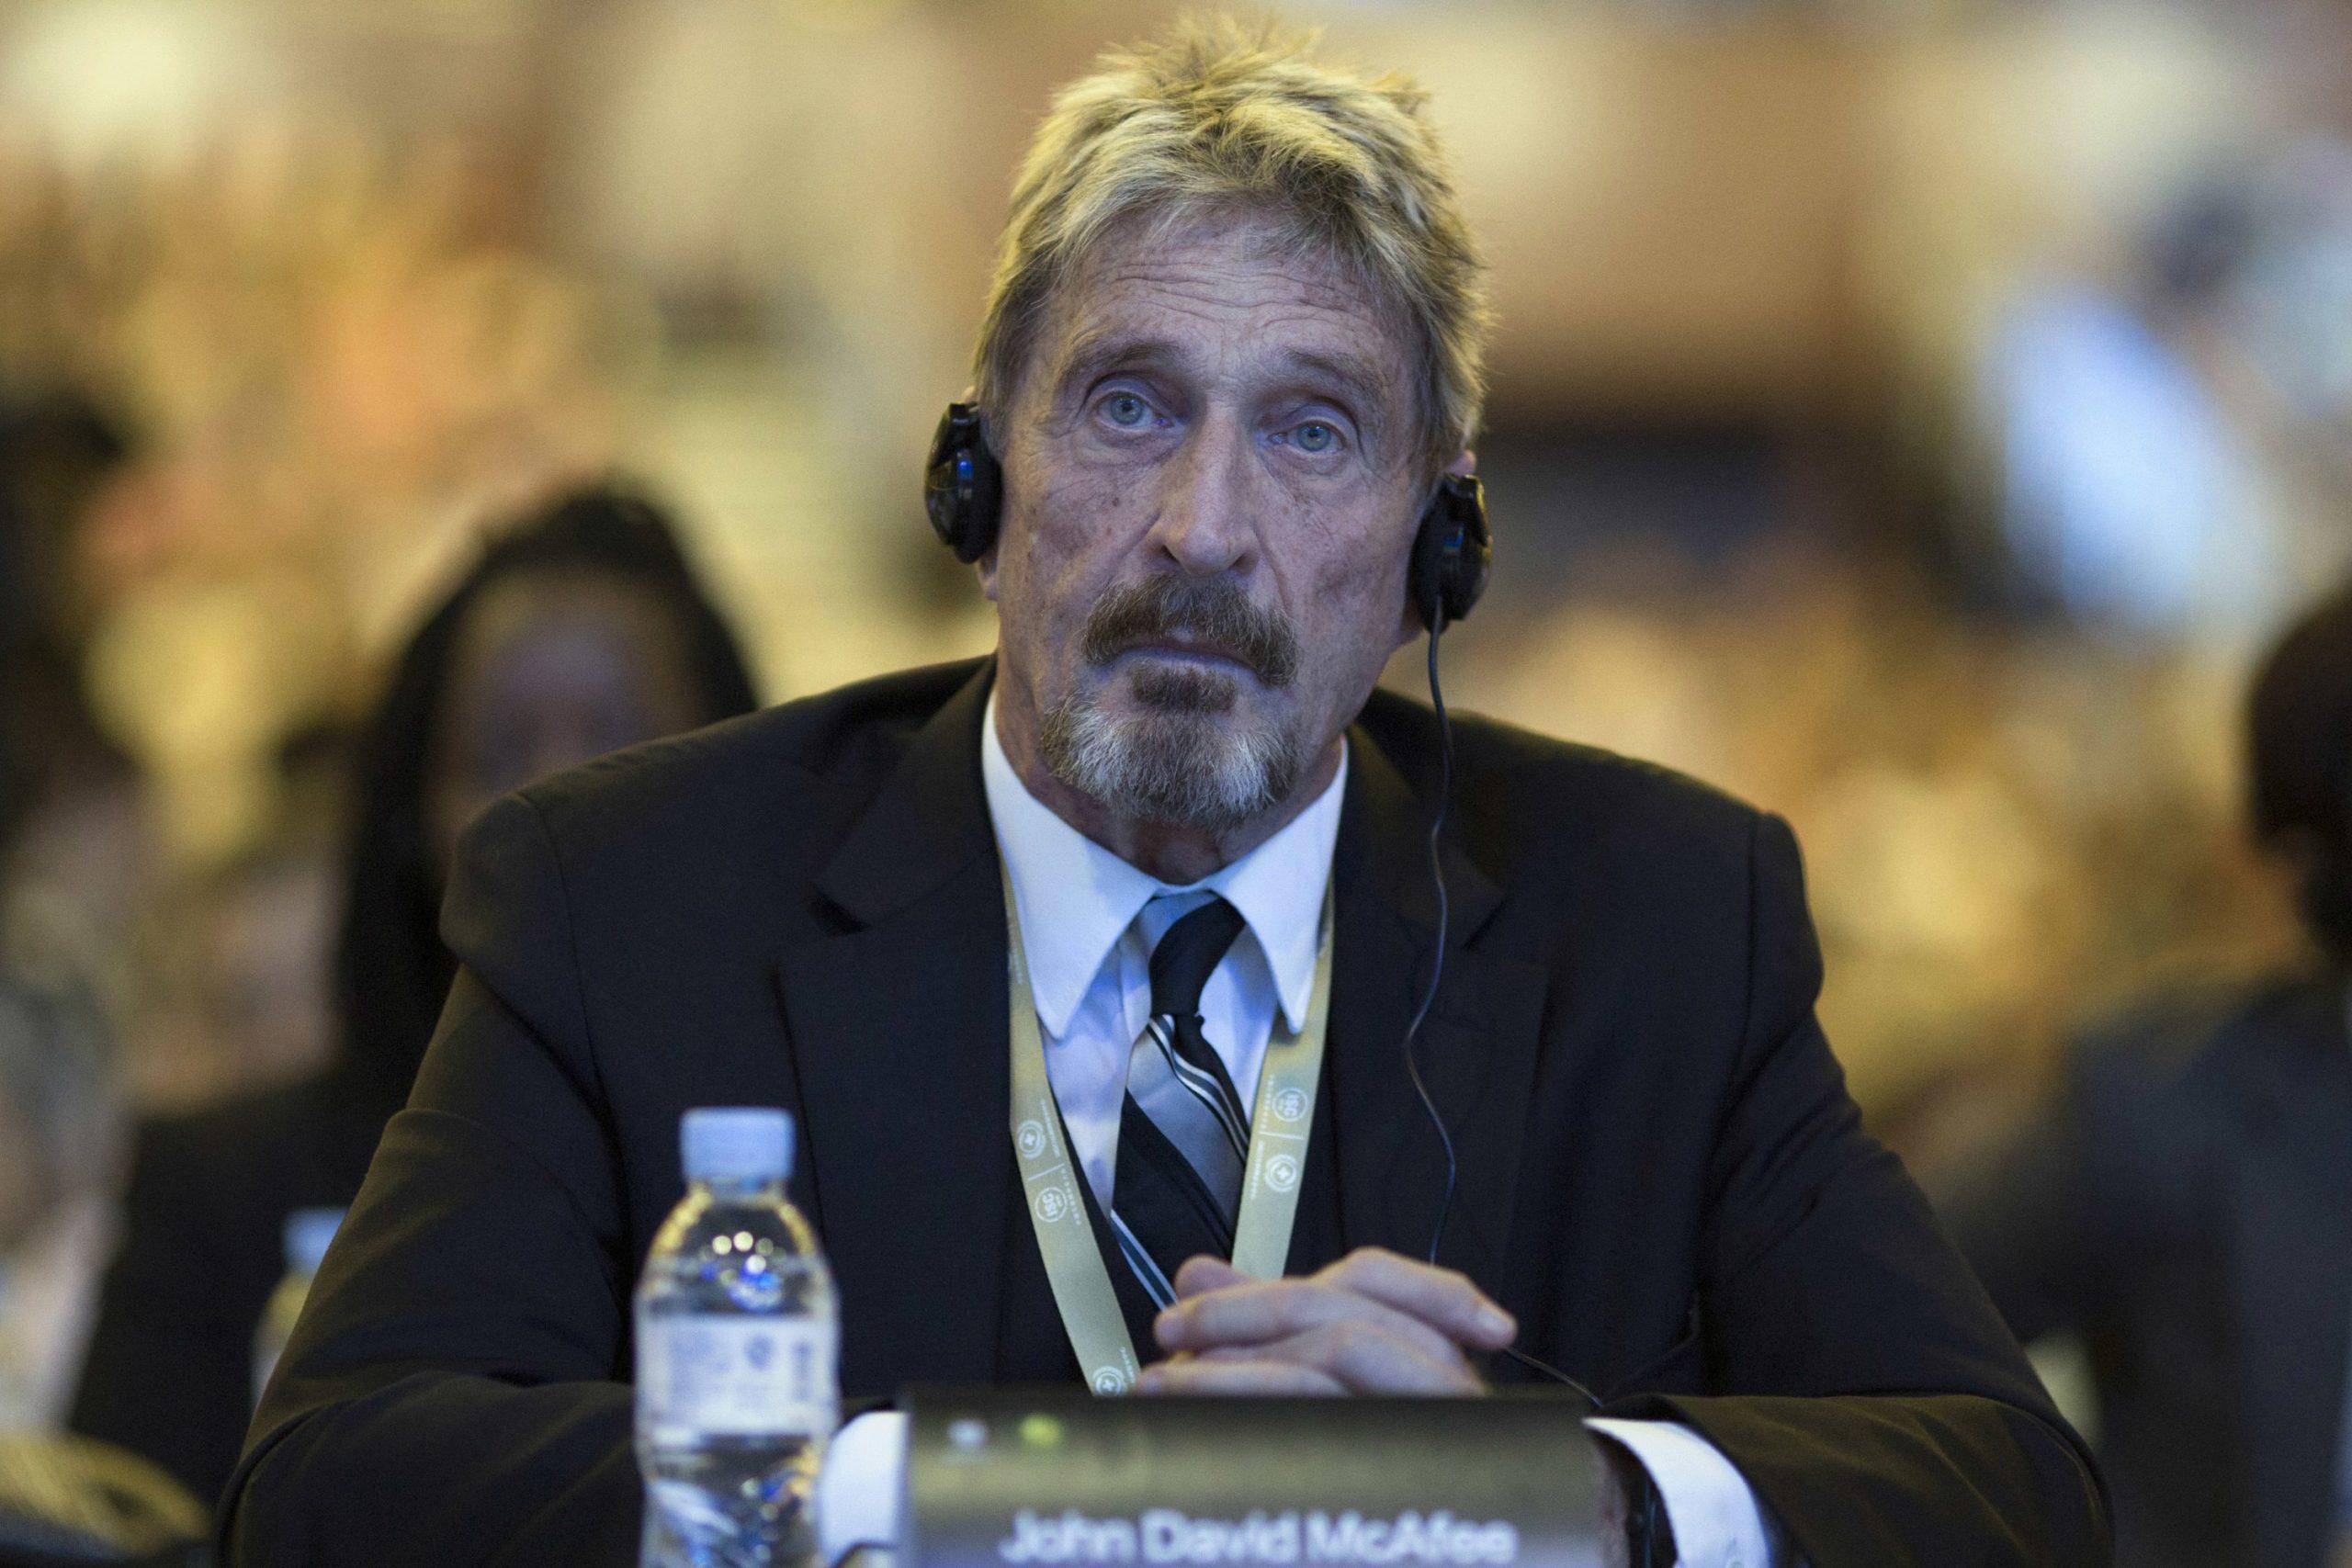 McAfee, antivirus creator, found dead in apparent suicide